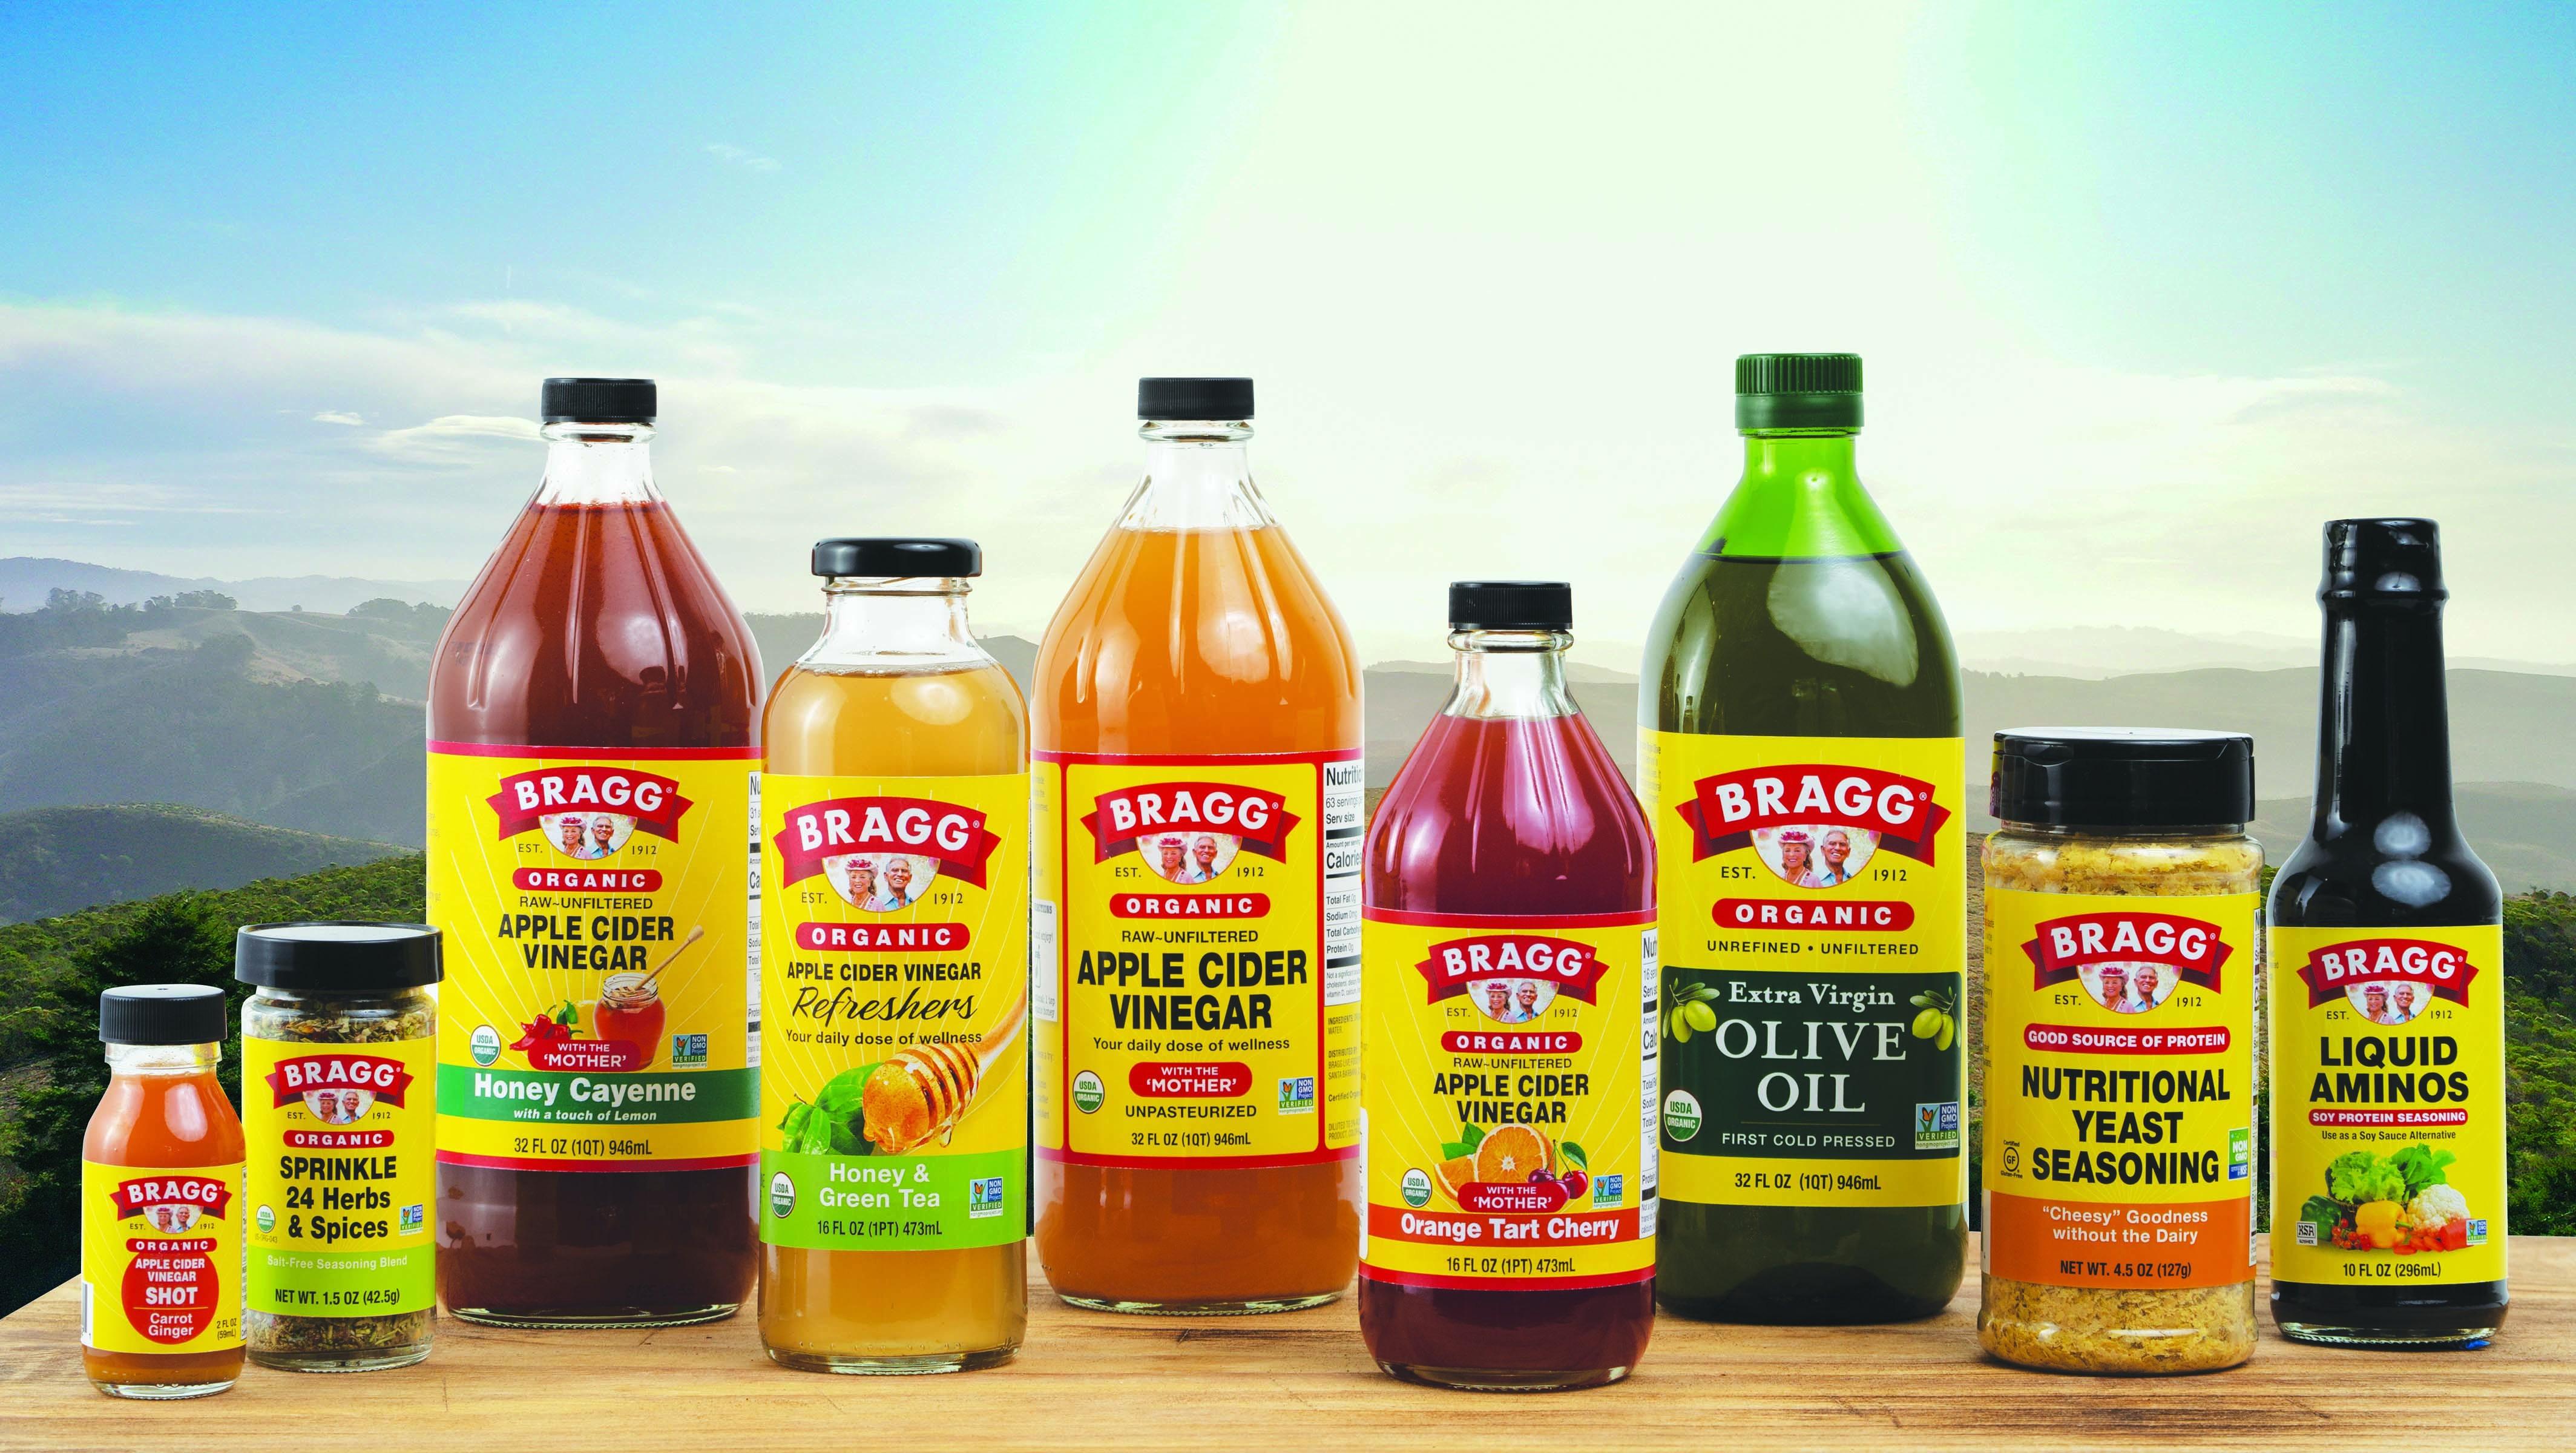 Bragg Live Food Products, LLC | LinkedIn